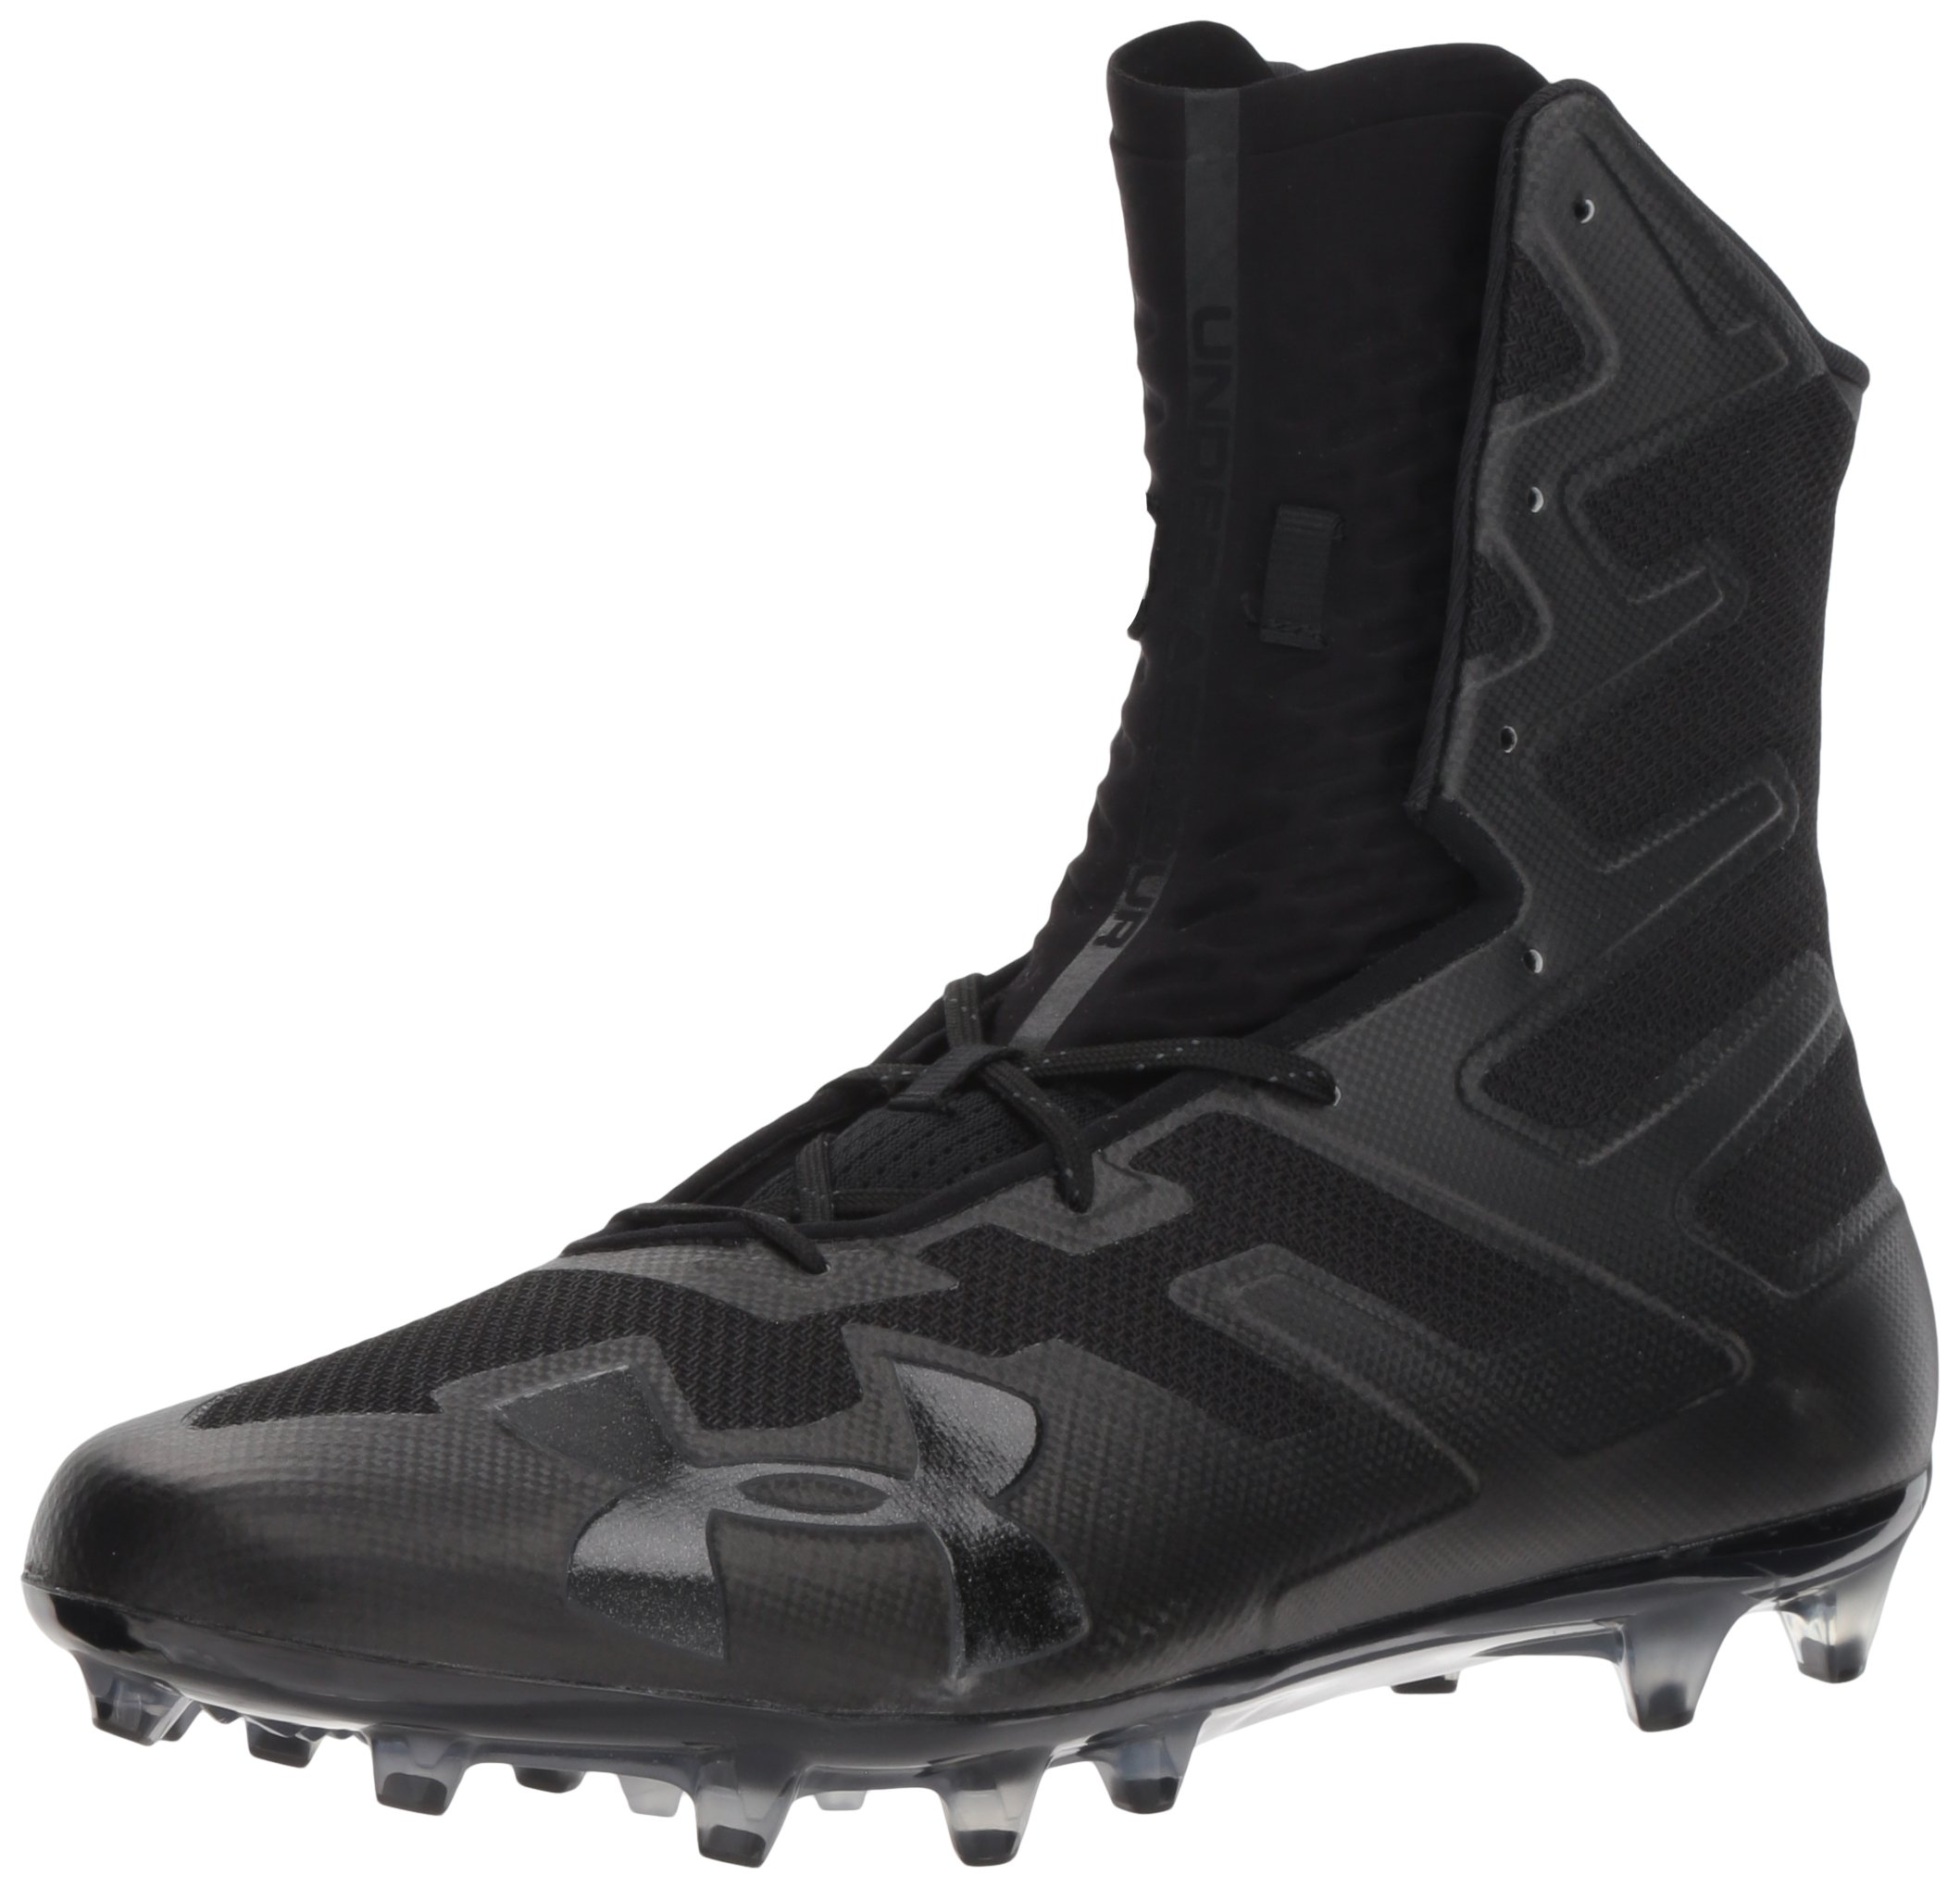 Under Armour Men's Highlight MC Football Shoe 001/Black, 6.5